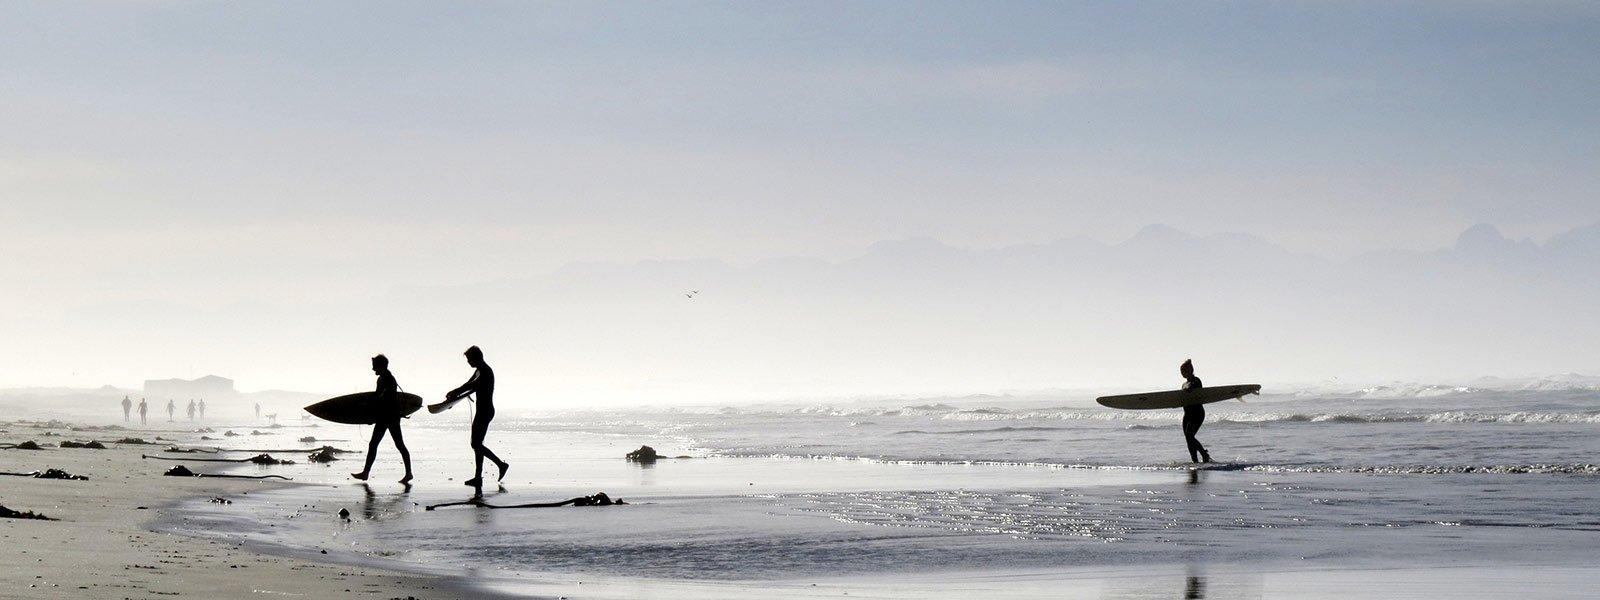 Alex Walker finds his Serengeti in the ocean